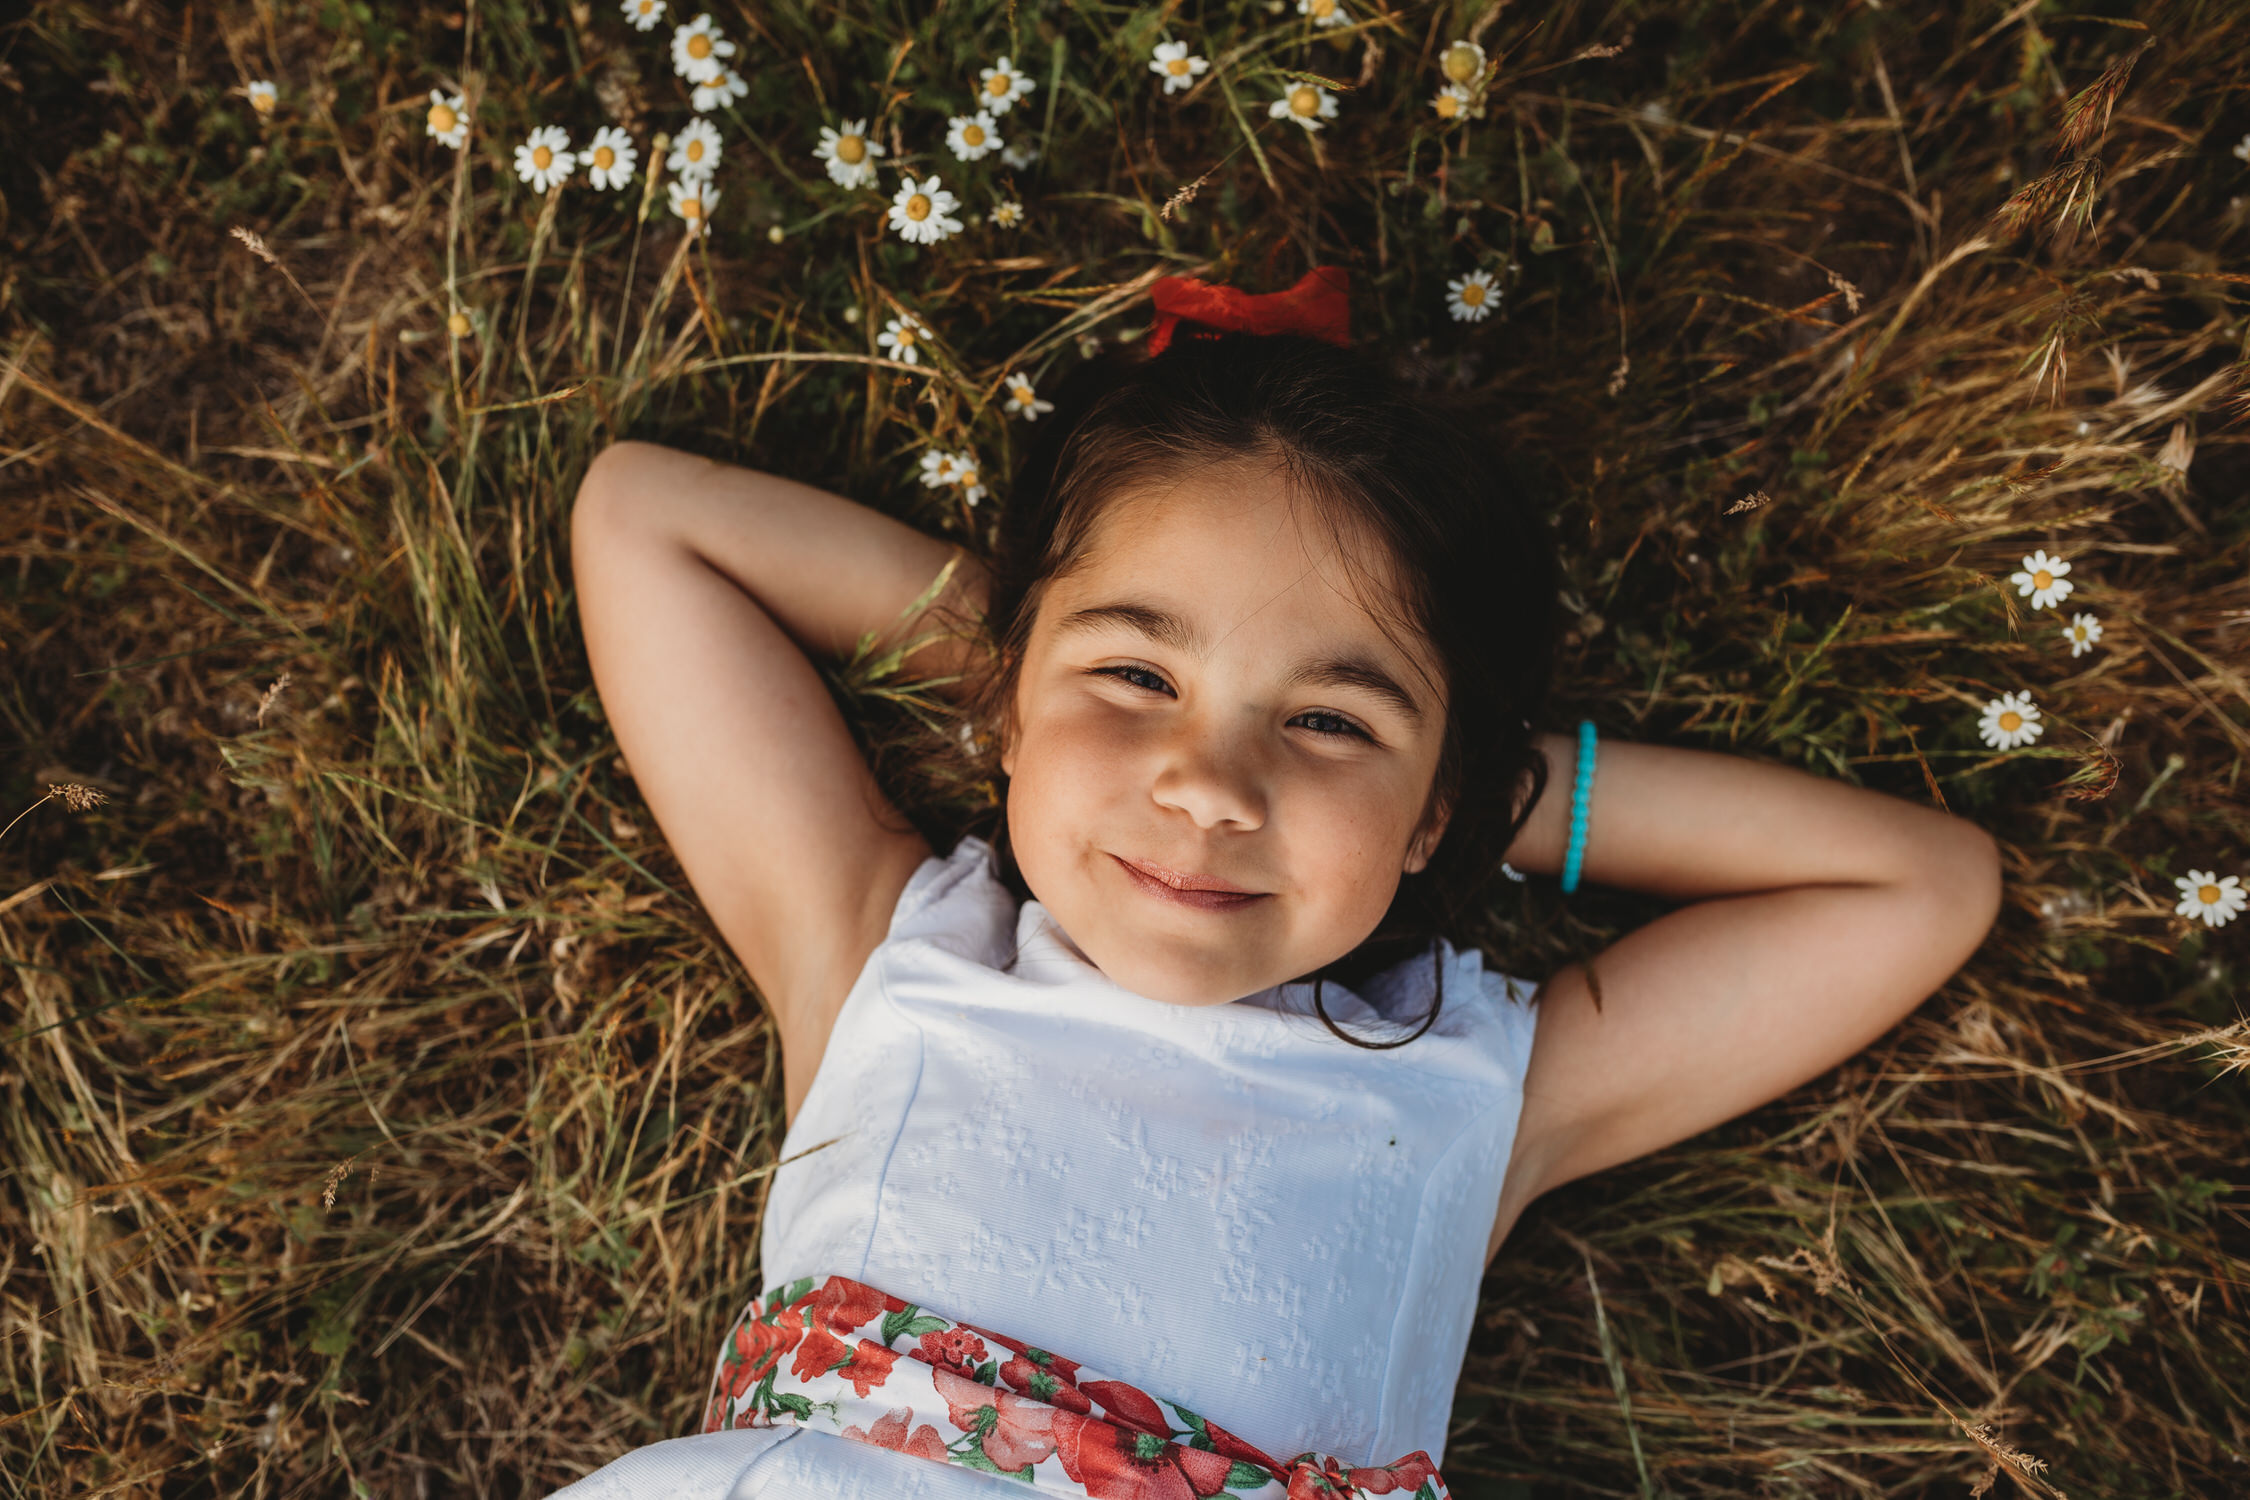 niña_tumbada_en_la_hierba